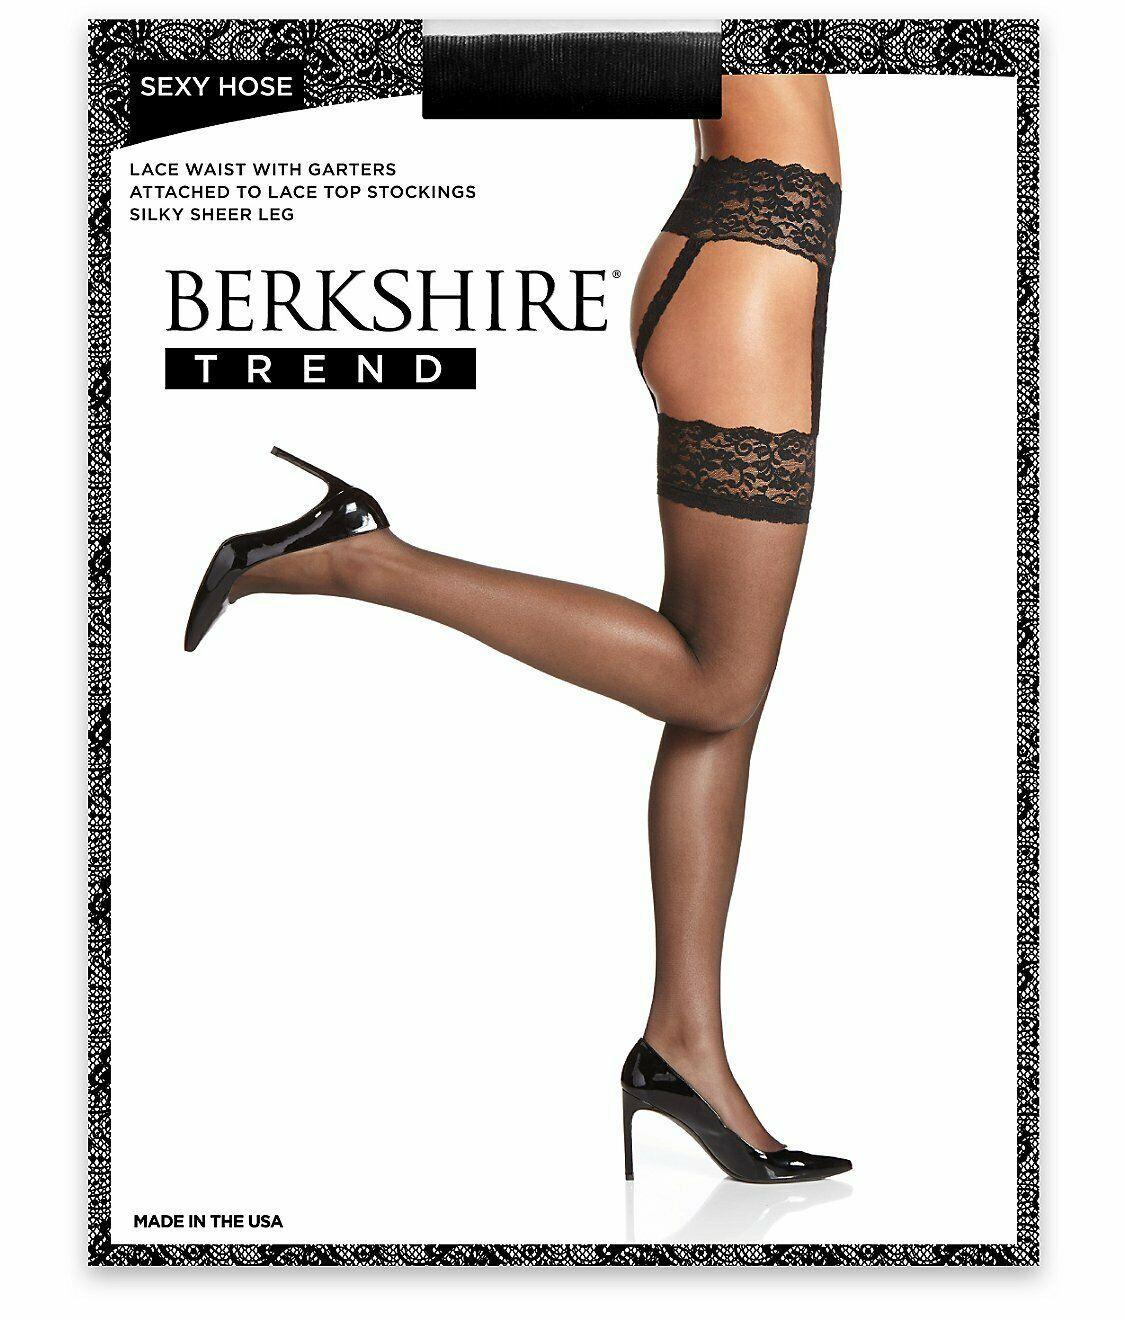 Berkshire BLACK Sexy Hose Lace Waist Garter Stockings, 2-Pack,US Queen1